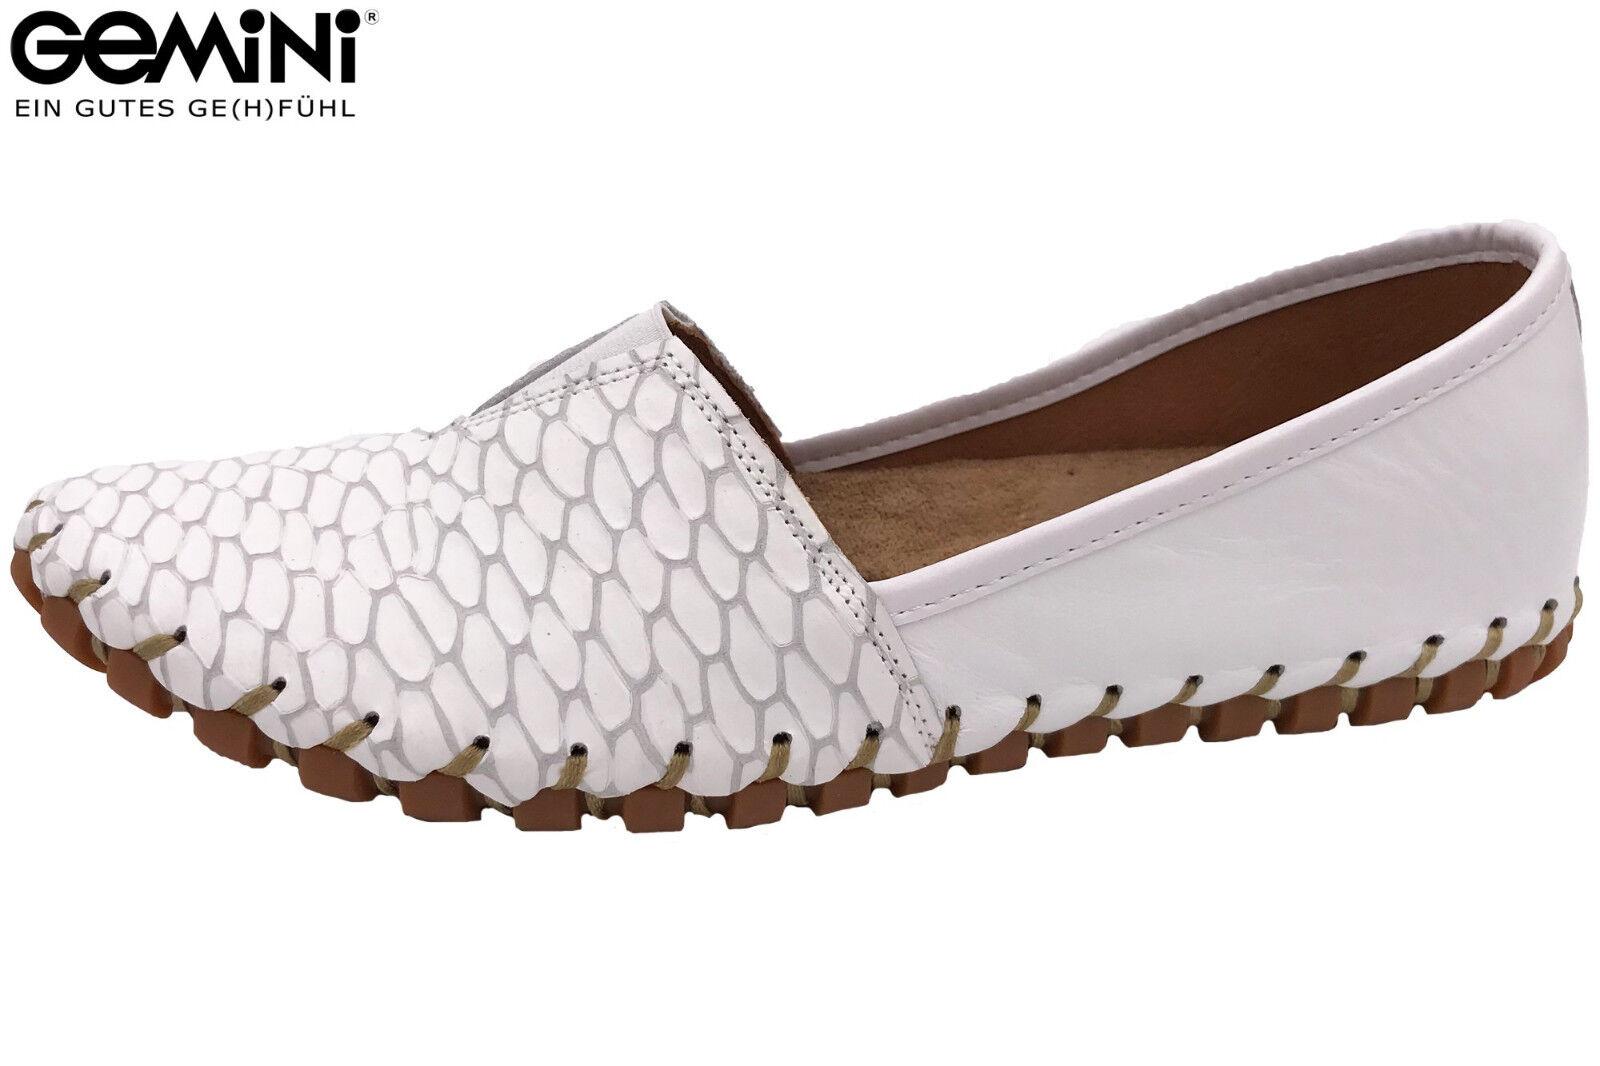 Slipper Leder Schuhe Sommer Weiß Ballerina Damen NEU Gemini